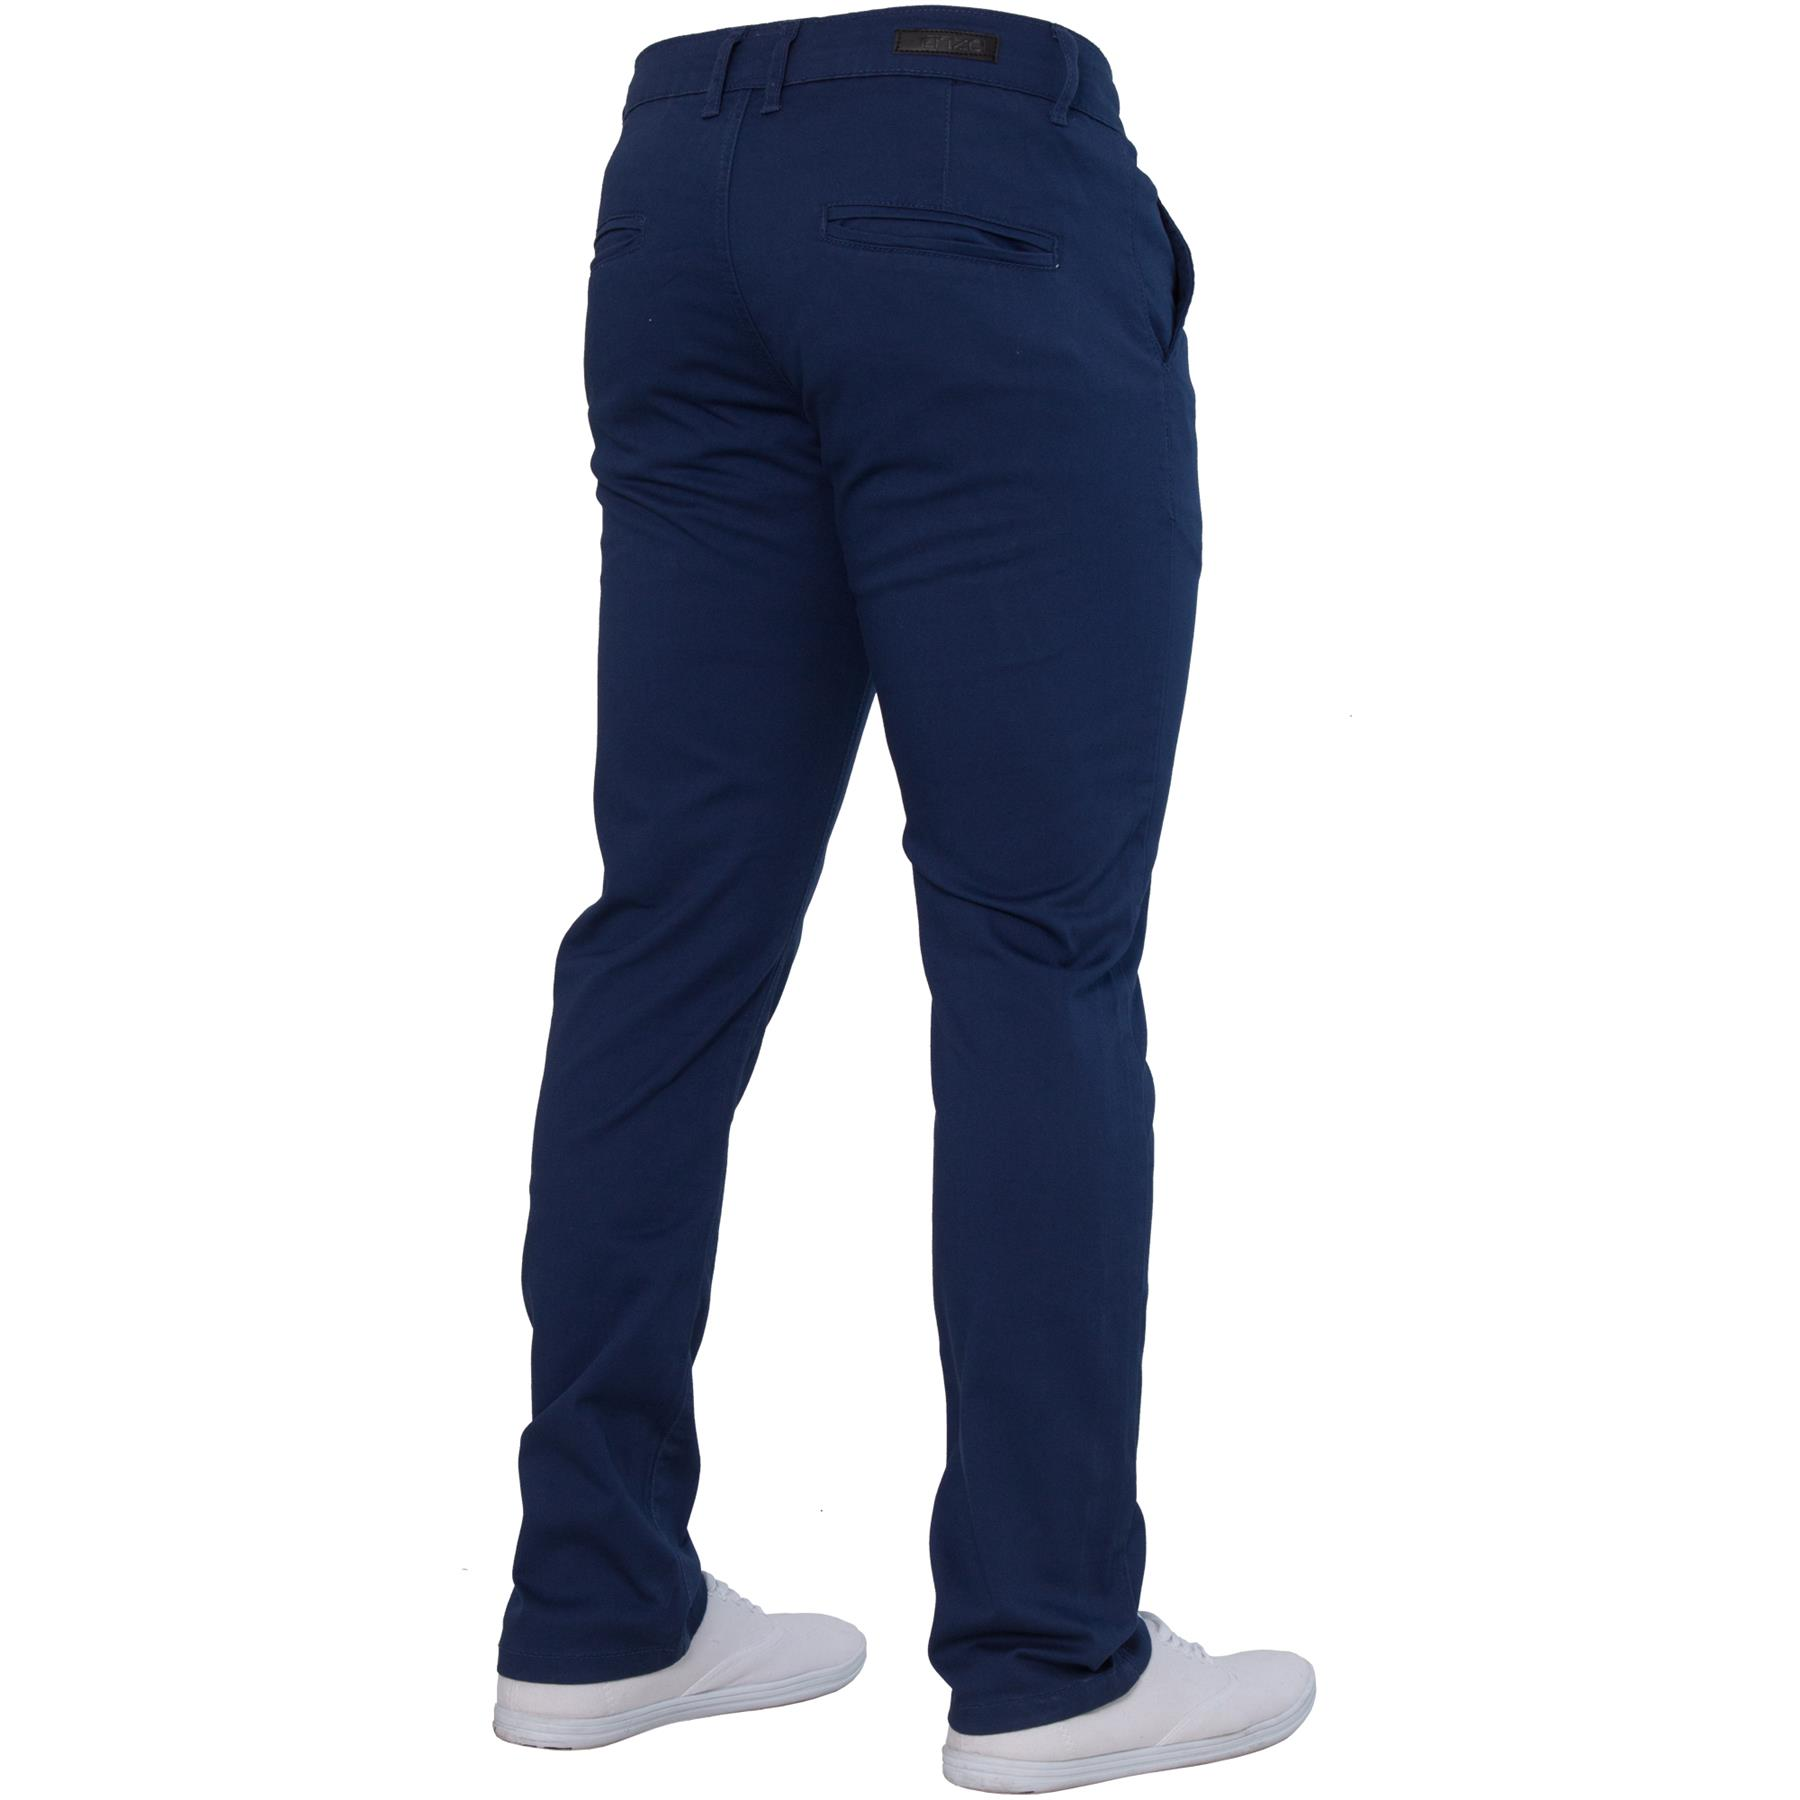 Enzo-Mens-Big-Tall-Jeans-Leg-King-Size-Denim-Pants-Chino-Trousers-Pants-44-034-60-034 thumbnail 9